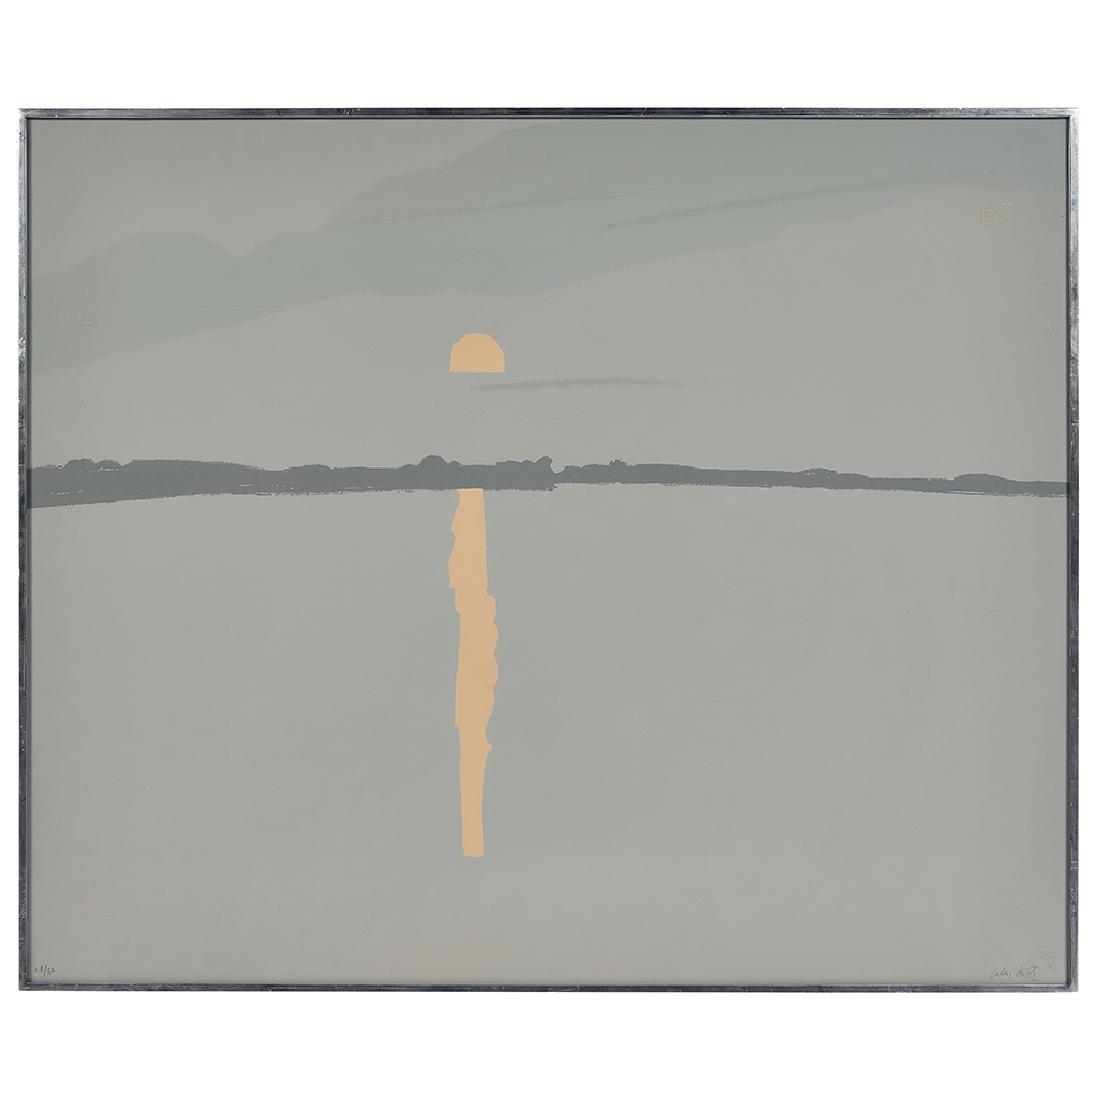 Alex Katz, Sunset, Lake Wesserumett, 1972 - 2